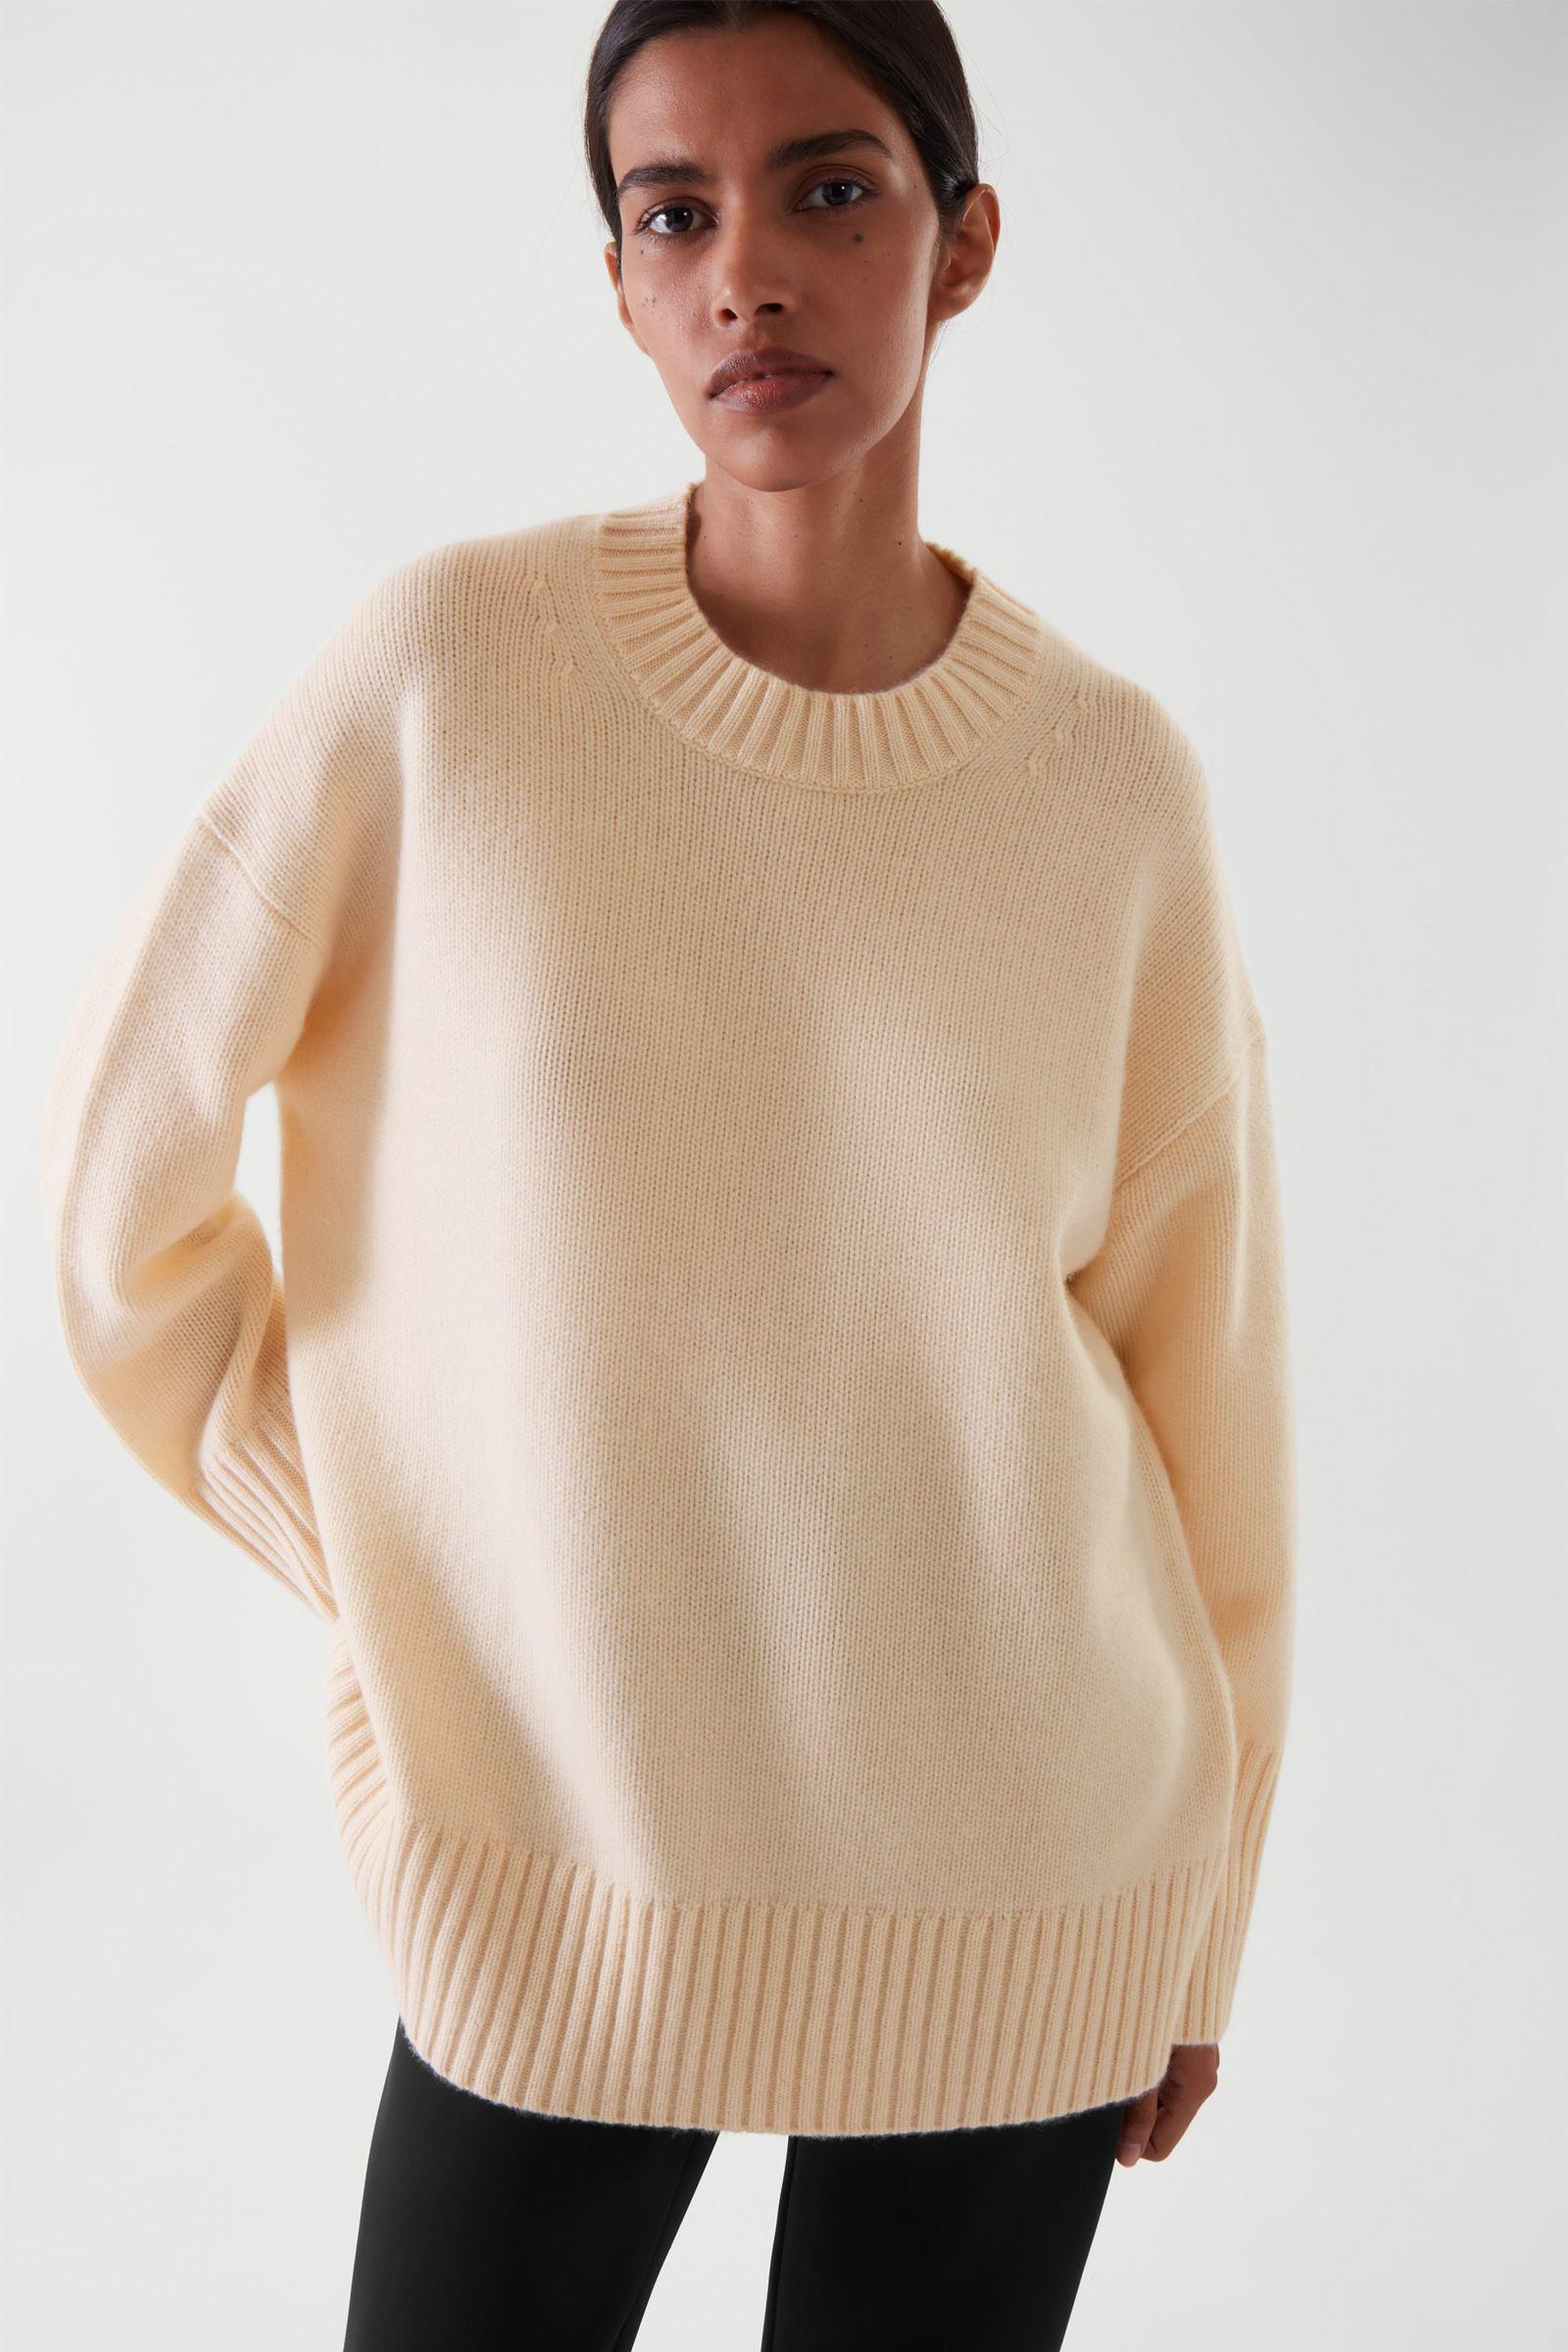 COS 오버사이즈 캐시미어 스웨터의 더스티 라이트 피치컬러 ECOMLook입니다.